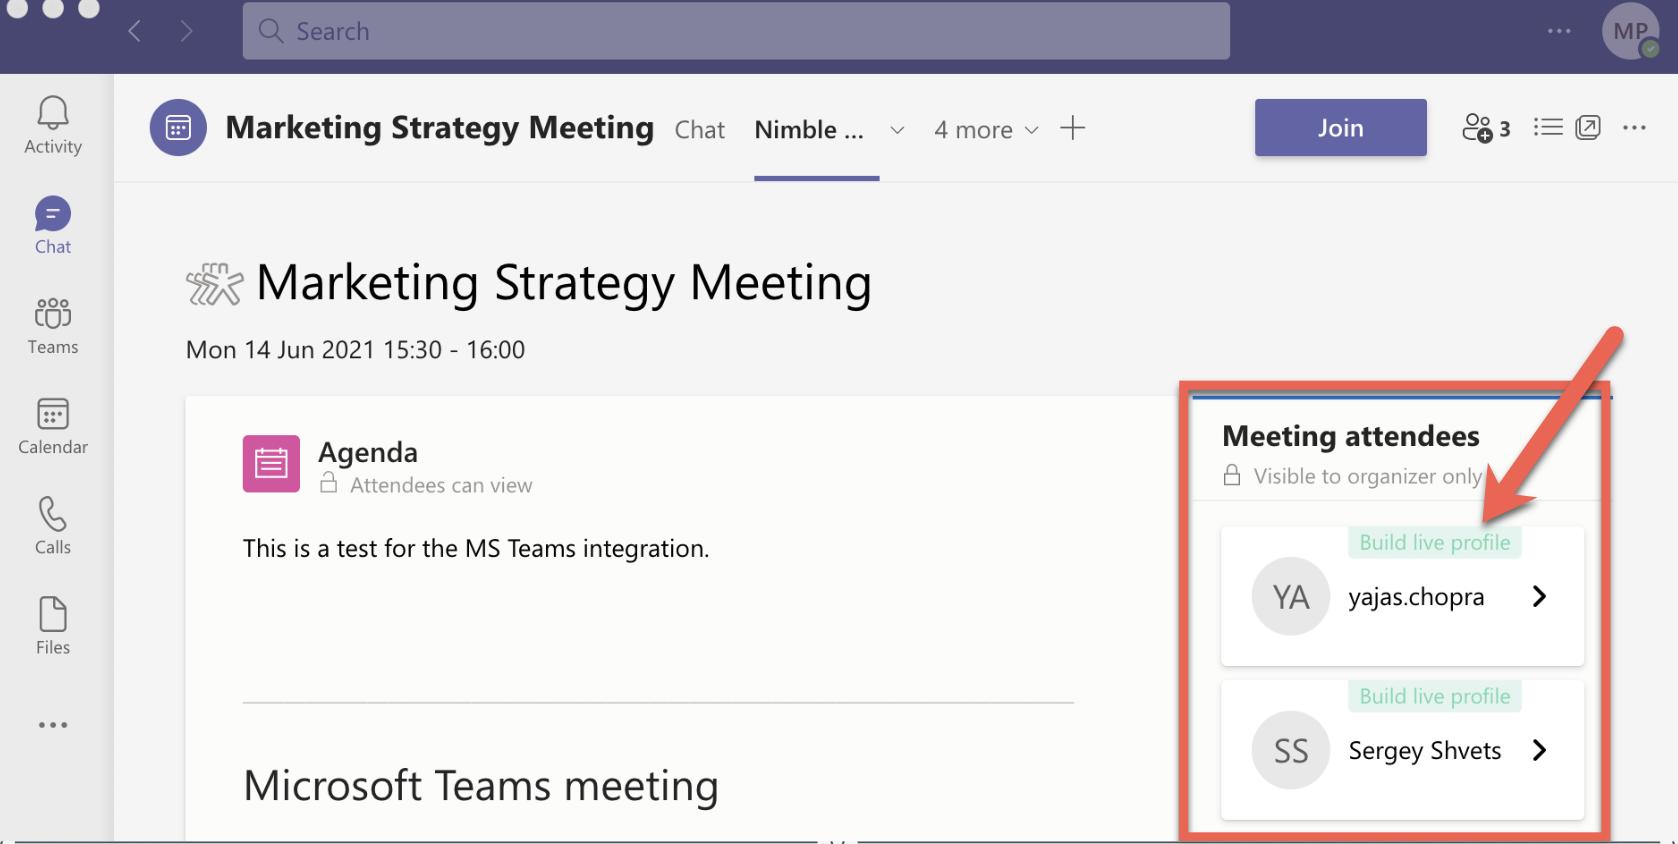 Microsoft Teams - Nimble - Build Live Profile